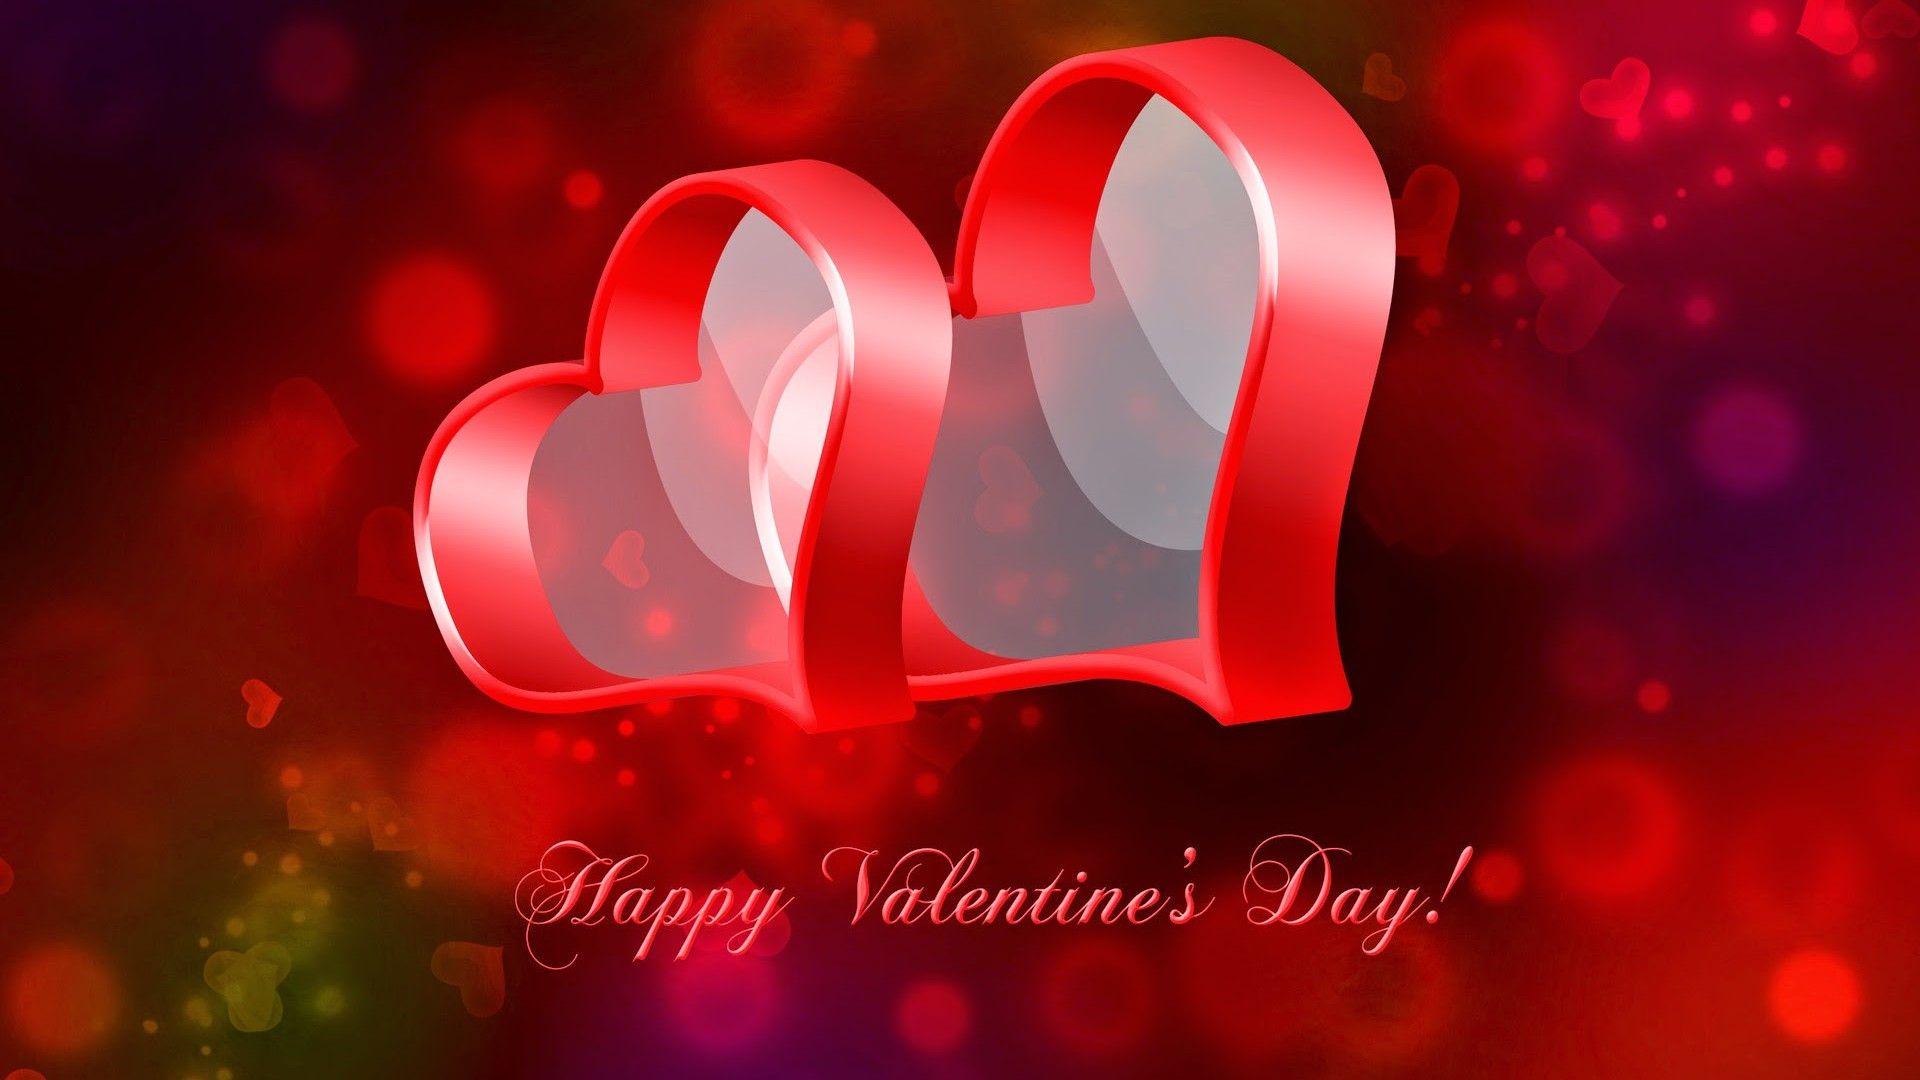 Image Of Love full hd image